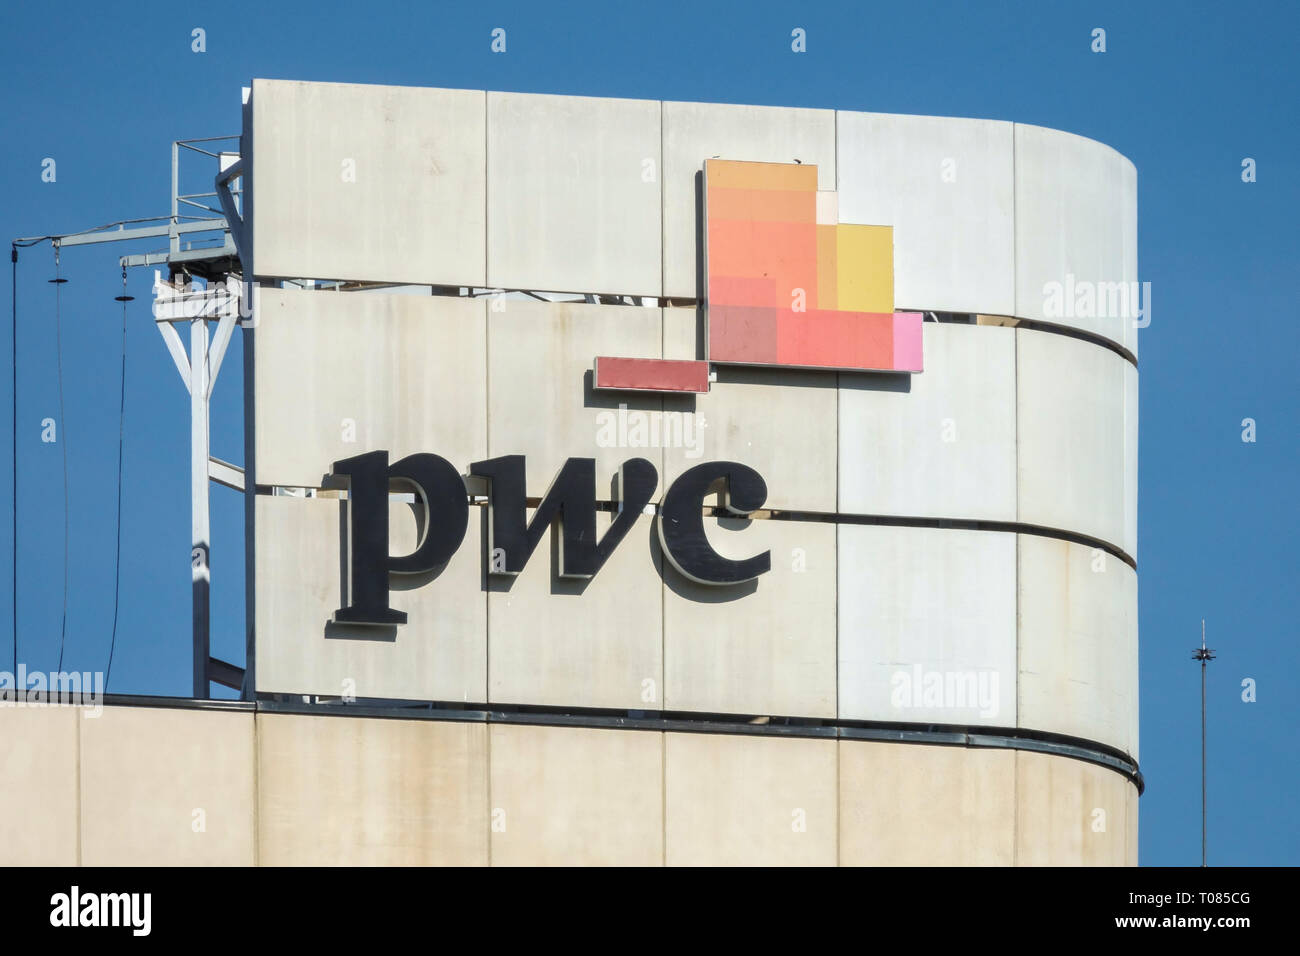 PWC logo, sign, Price Waterhouse Coopers, Valencia Spain - Stock Image